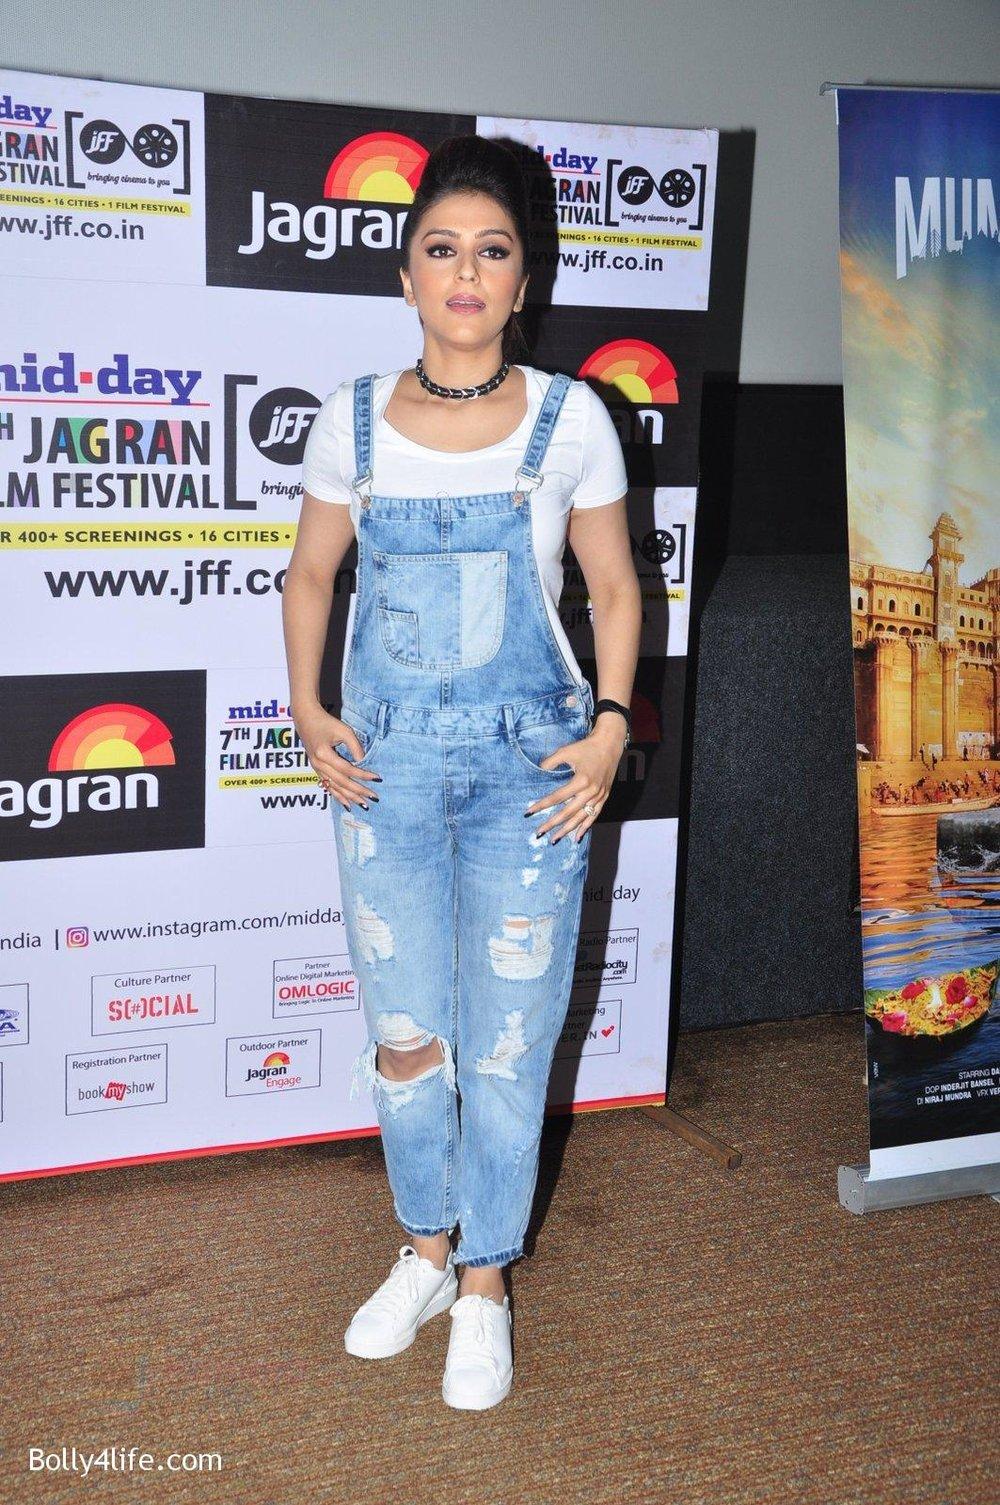 Aarti-Chhabria-at-Mumbai-Varanasi-screening-at-Jagran-film-fest-on-26th-Sept-2016-18.jpg